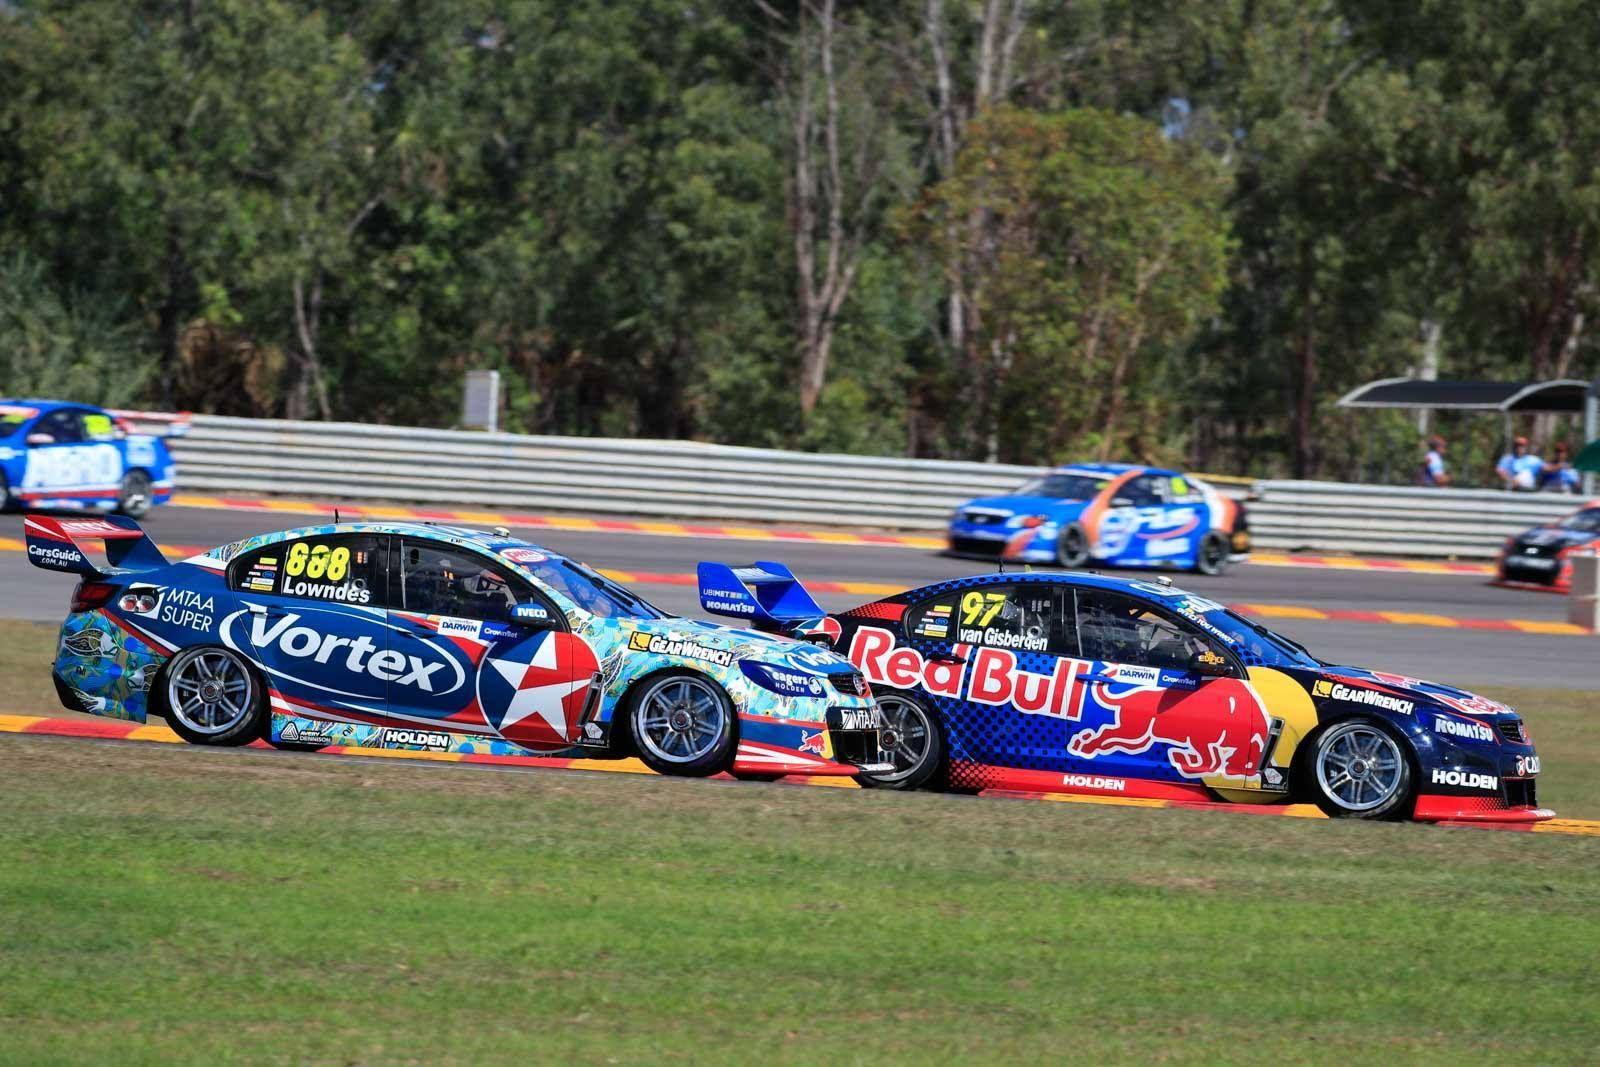 Darwin Triple Crown 2016 V8 supercars, Super cars